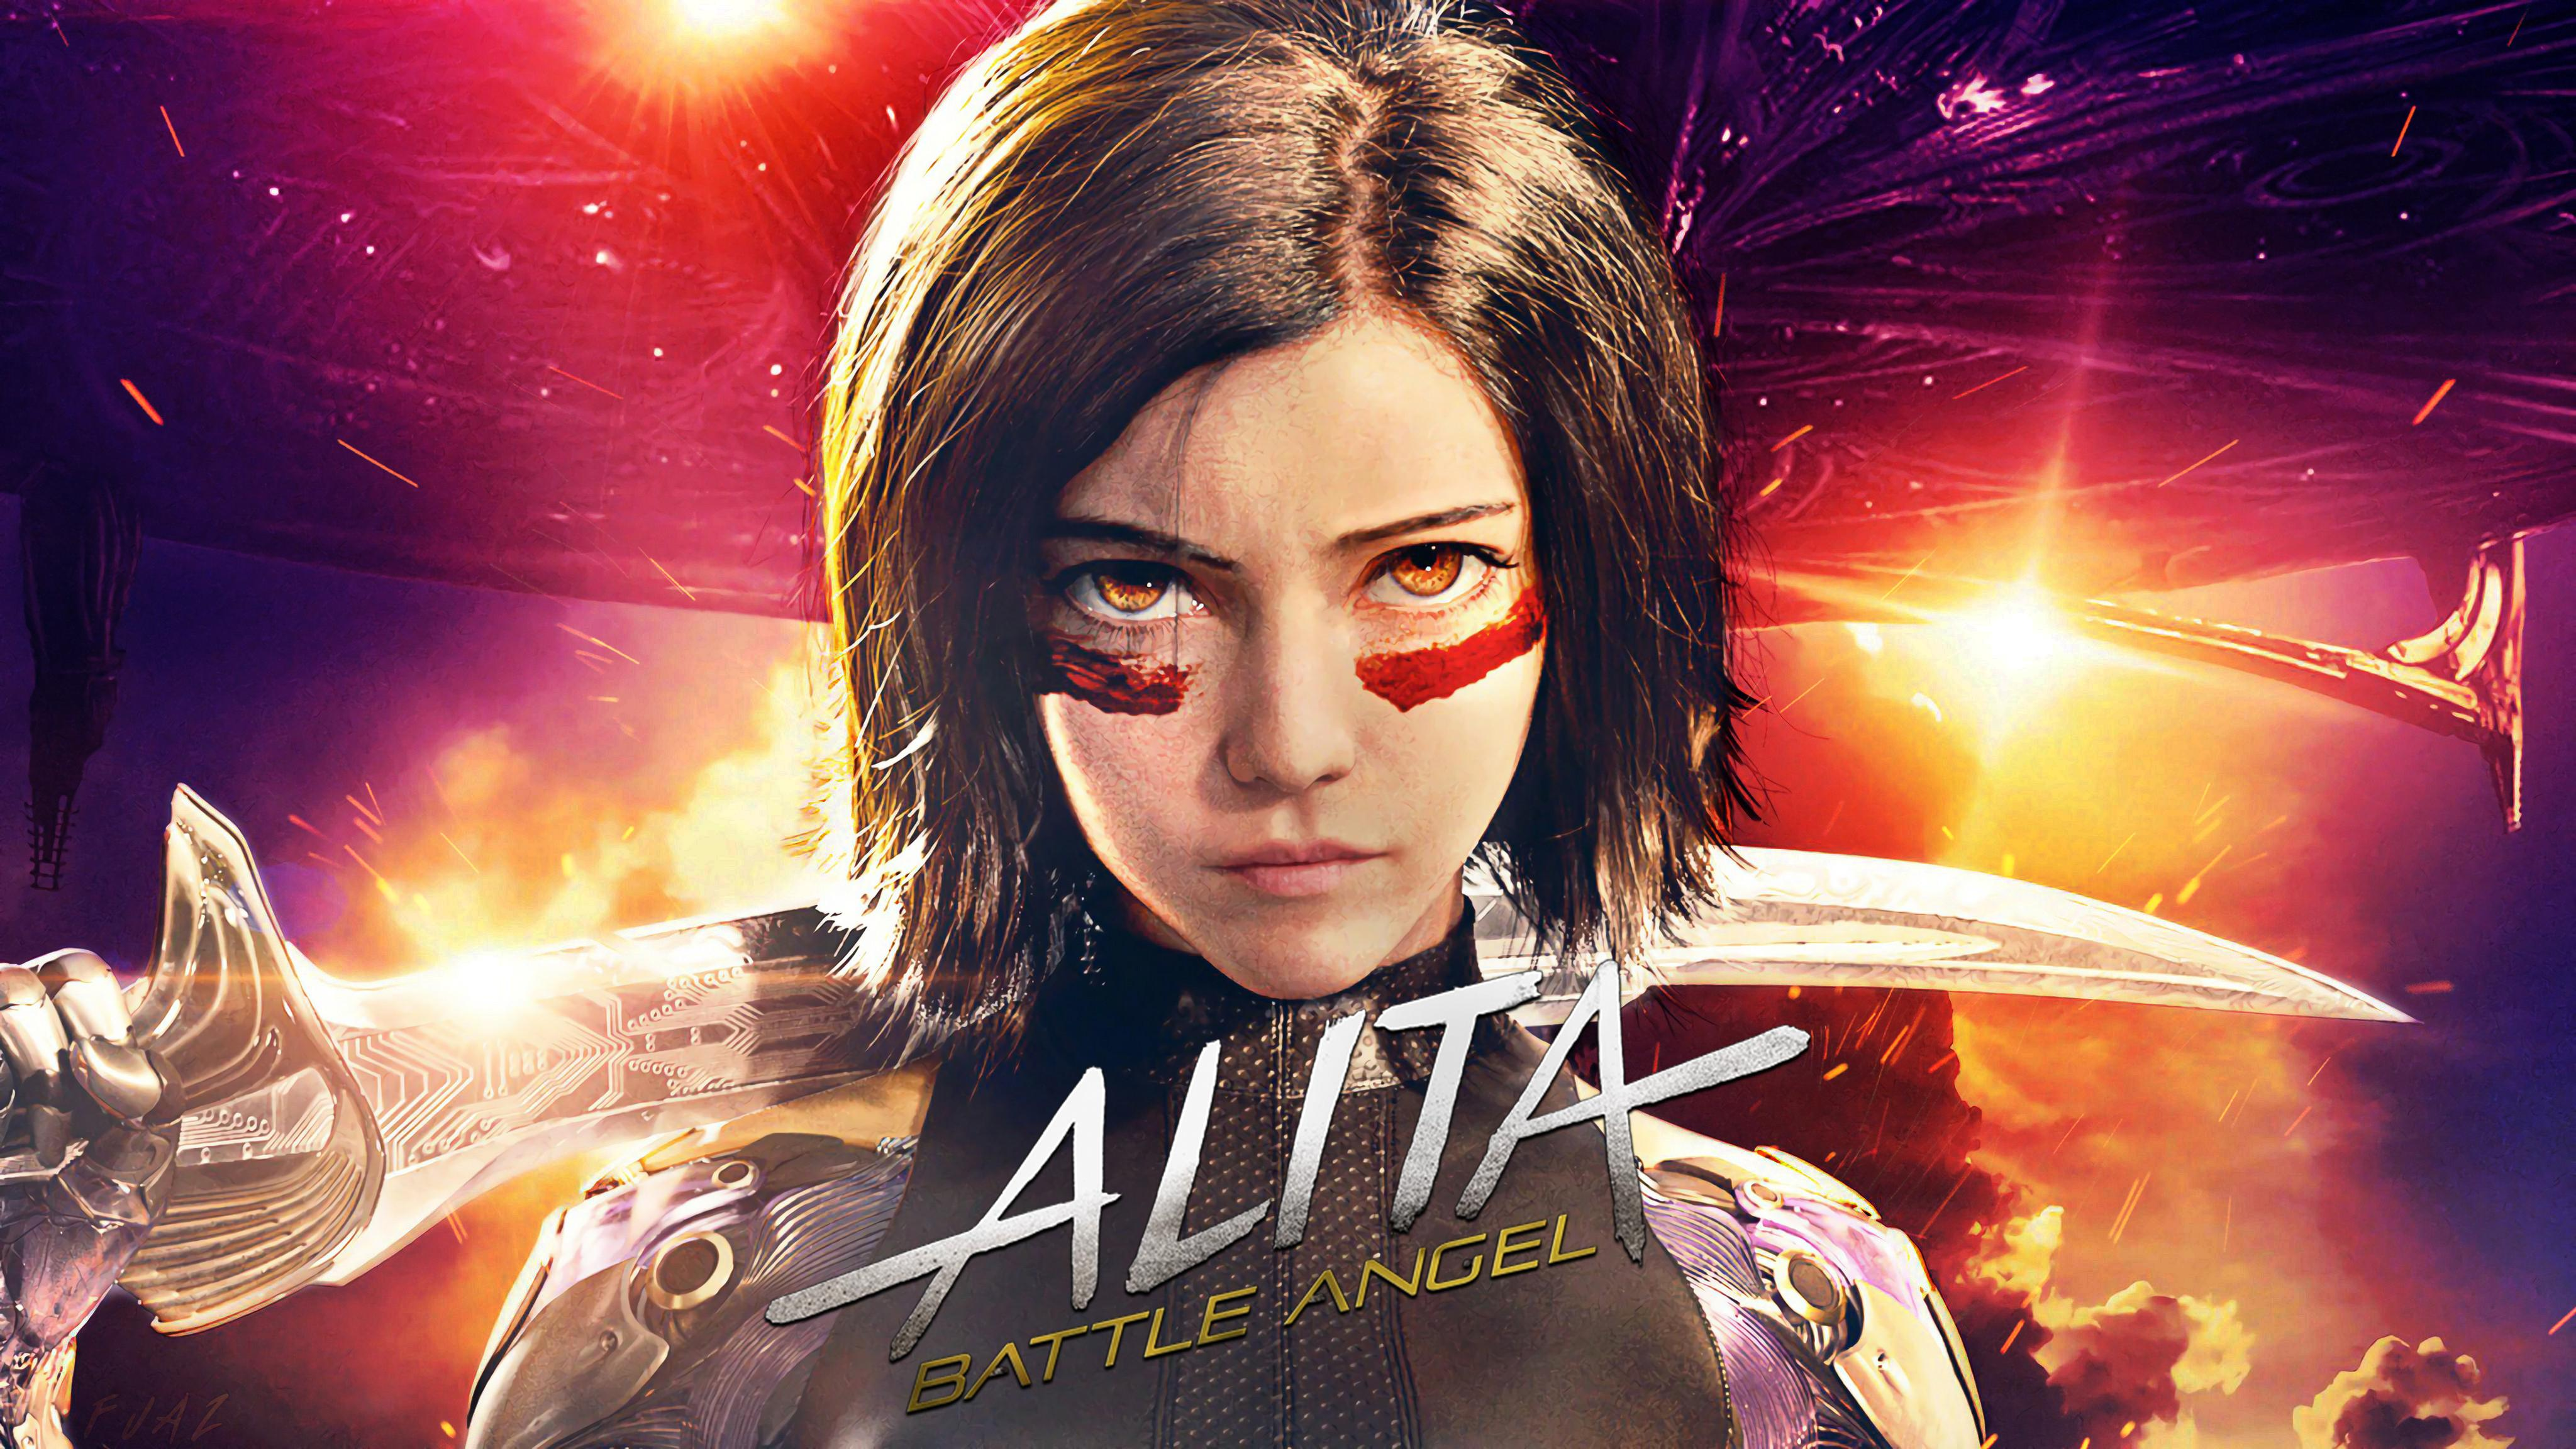 Alita Battle Angel Wallpapers Top Free Alita Battle Angel